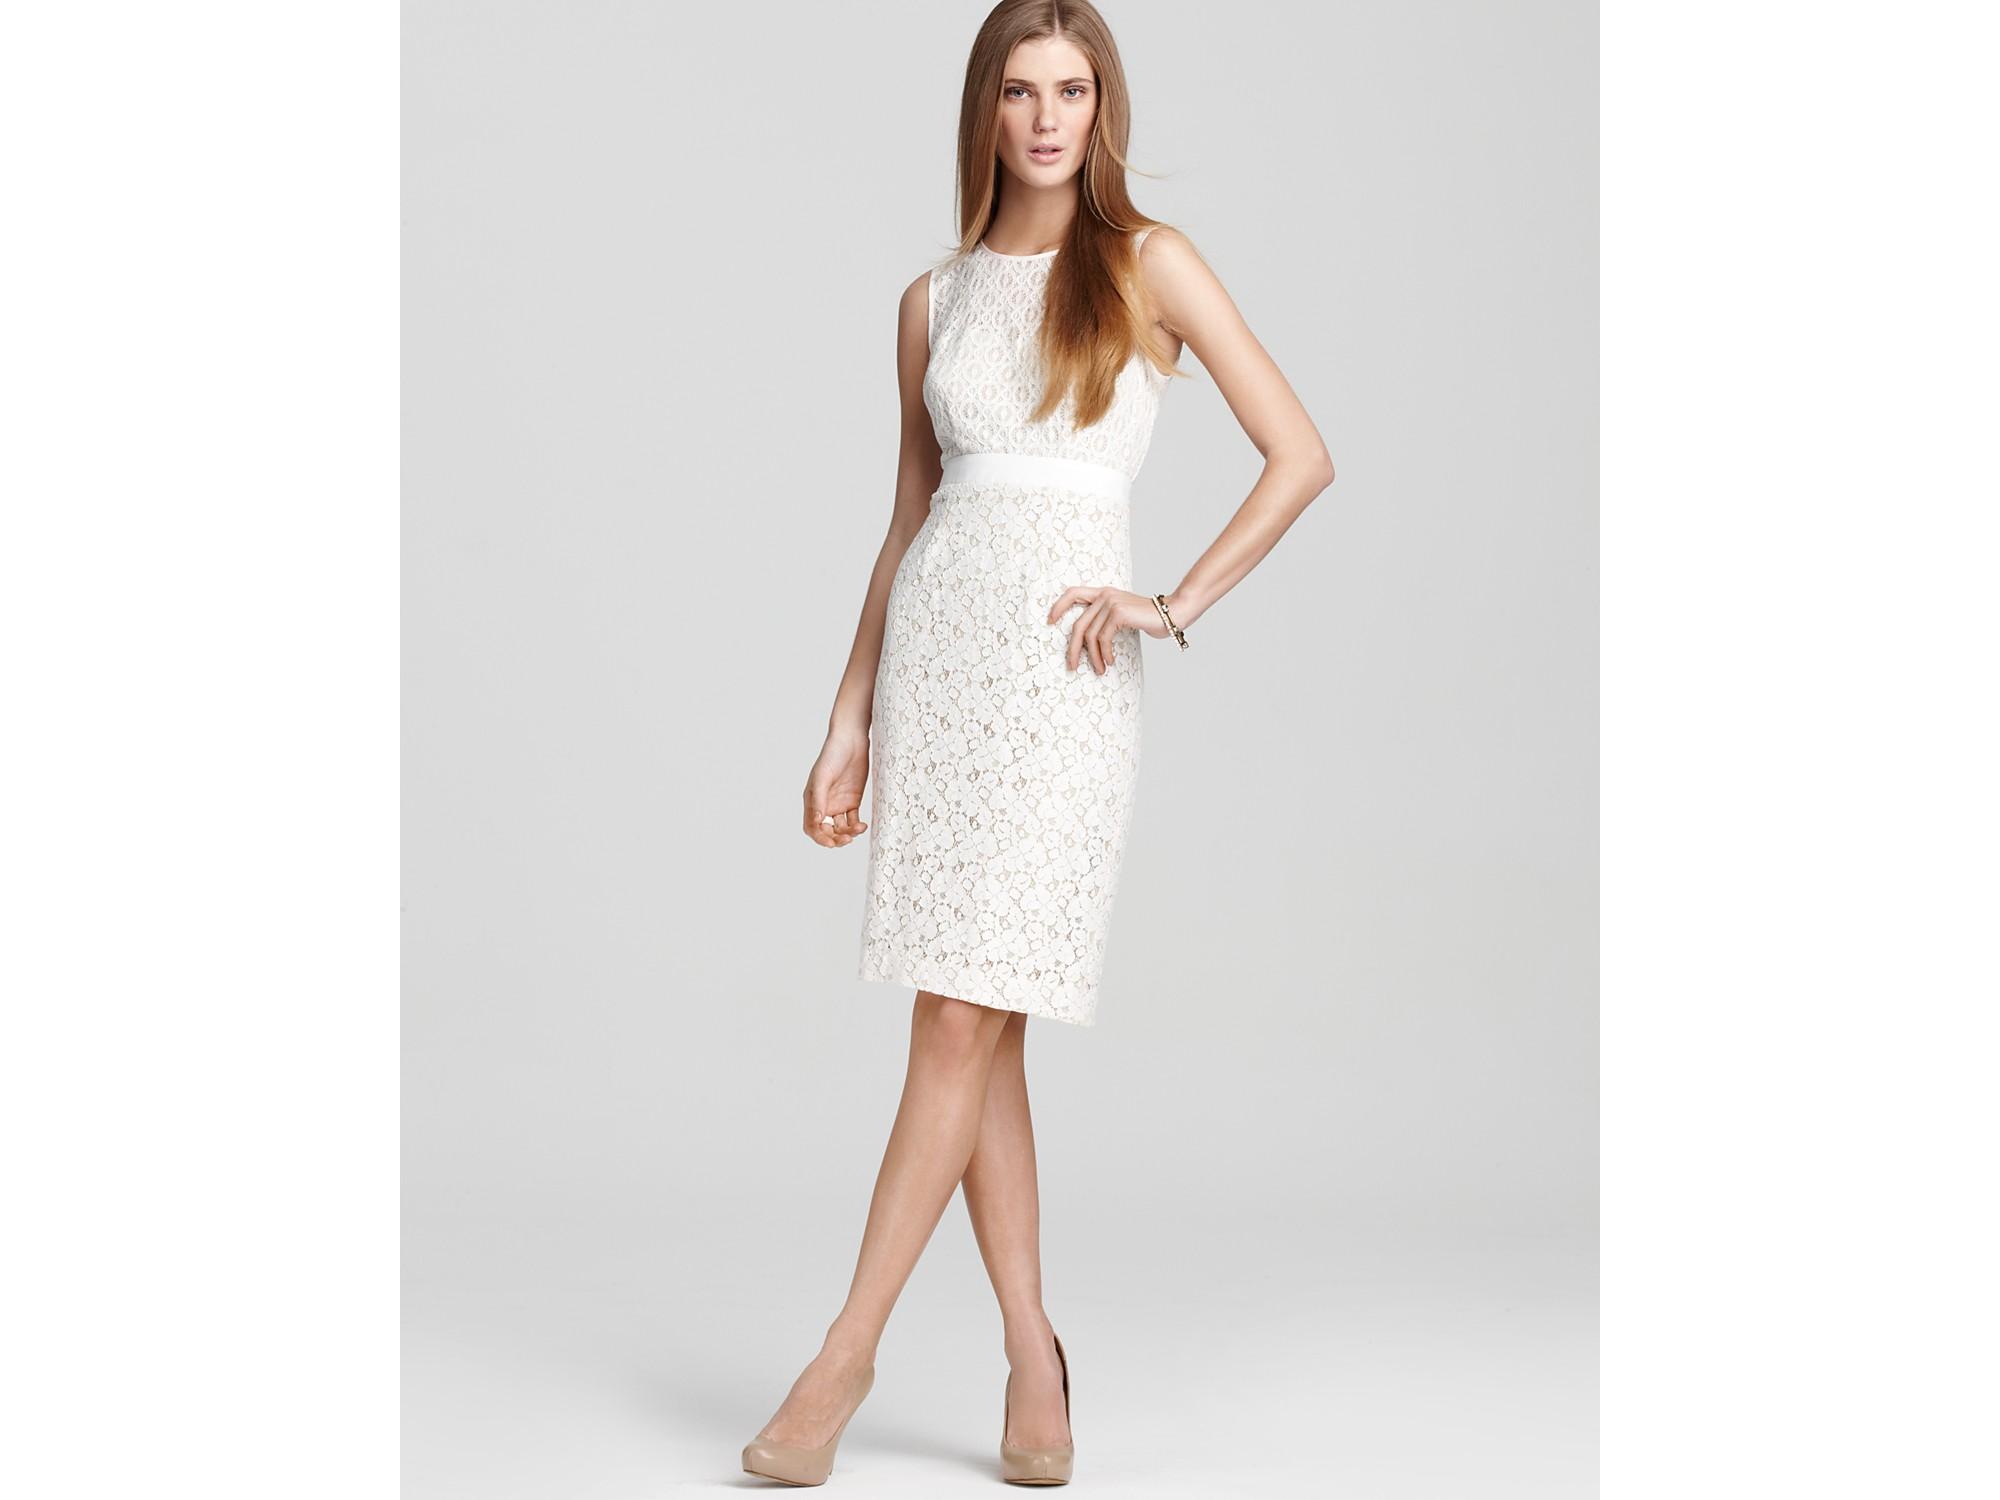 Bcbgmaxazria Dress Alice Mixed Lace Sheath Dress in White | Lyst